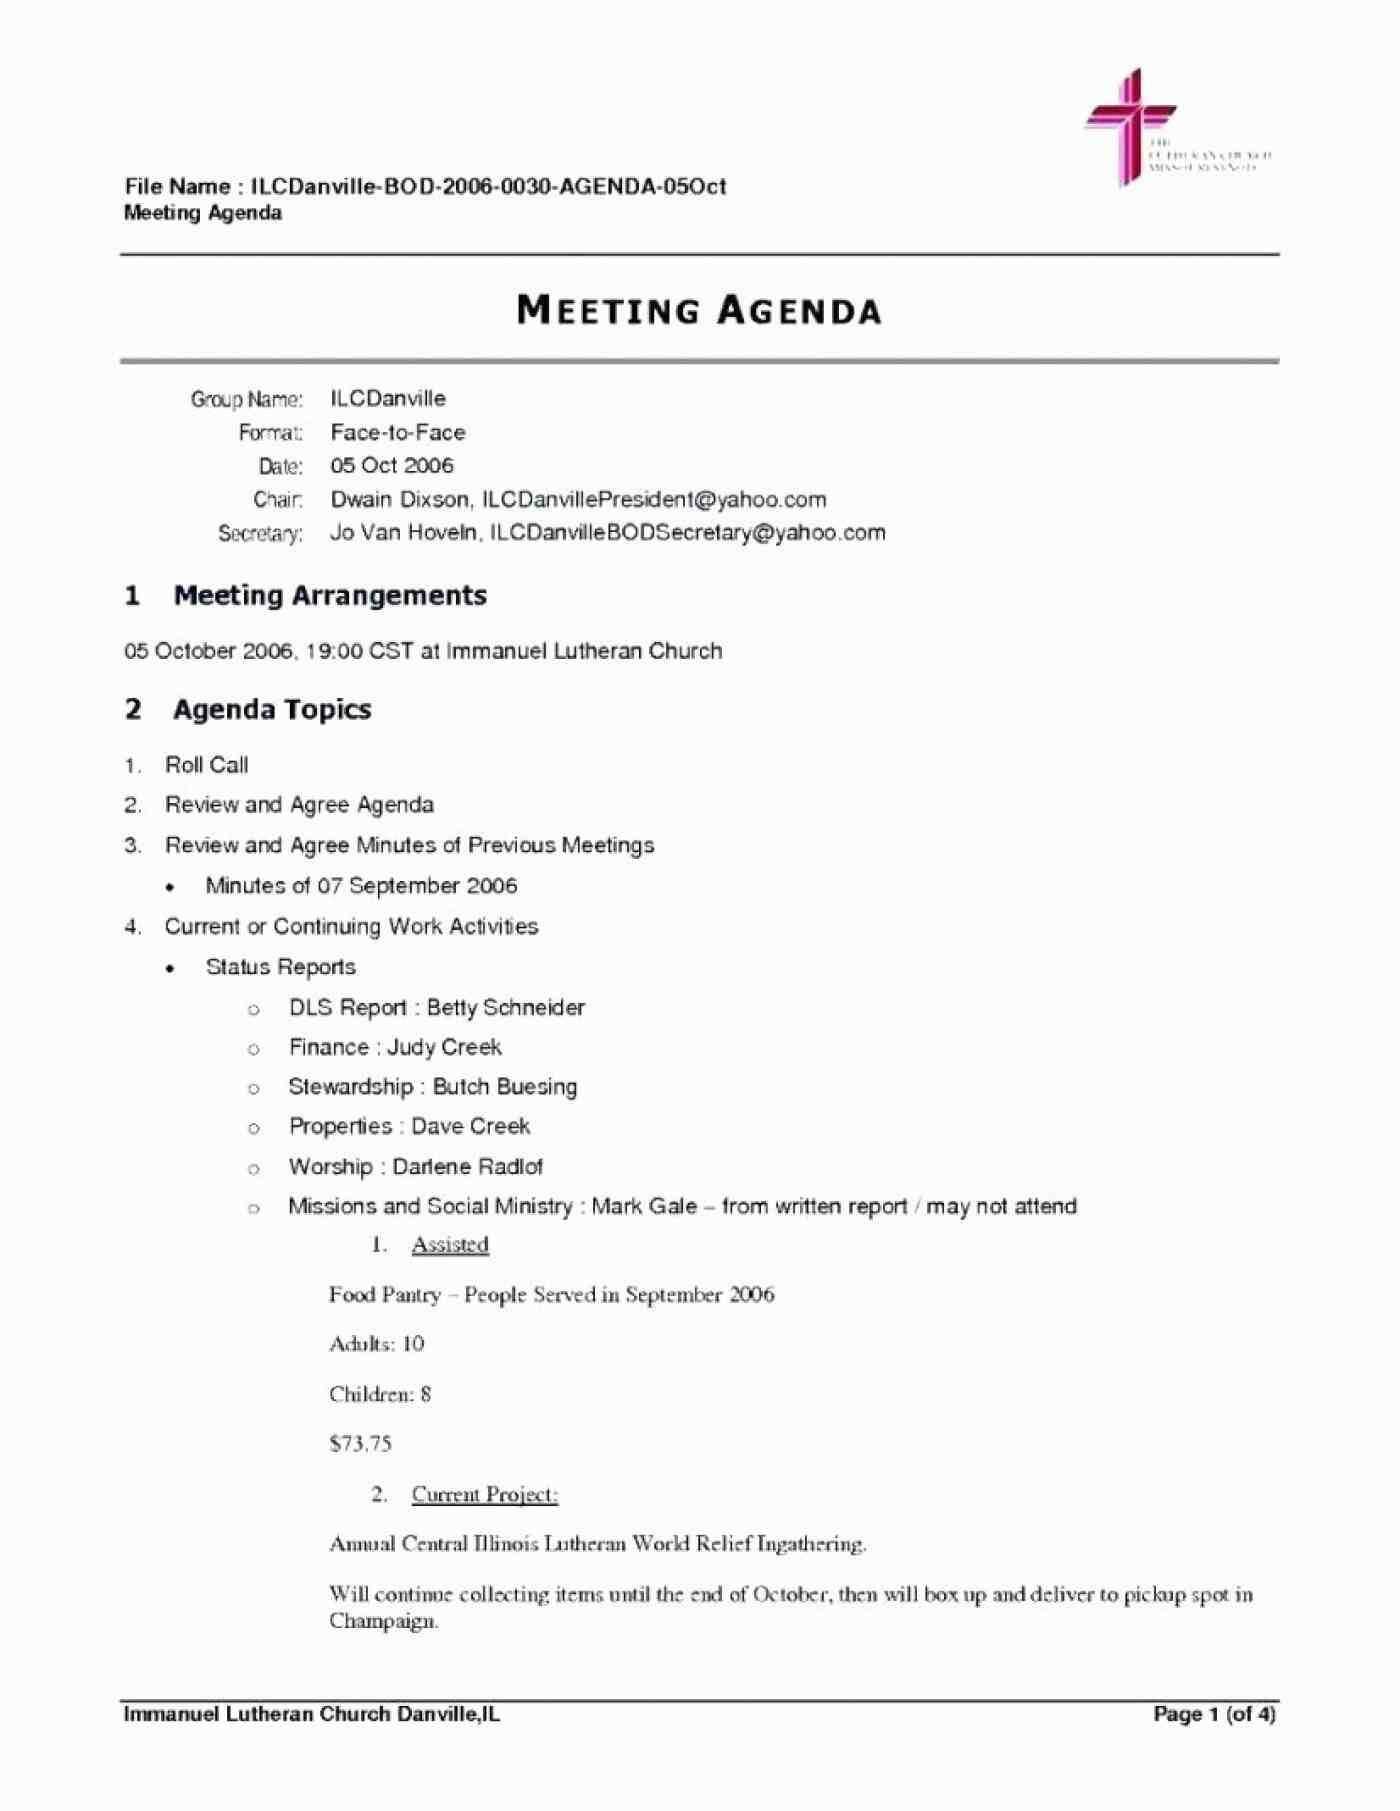 Meeting Agenda Template Free Word Agendas Office Inside With Free Meeting Agenda Templates For Word